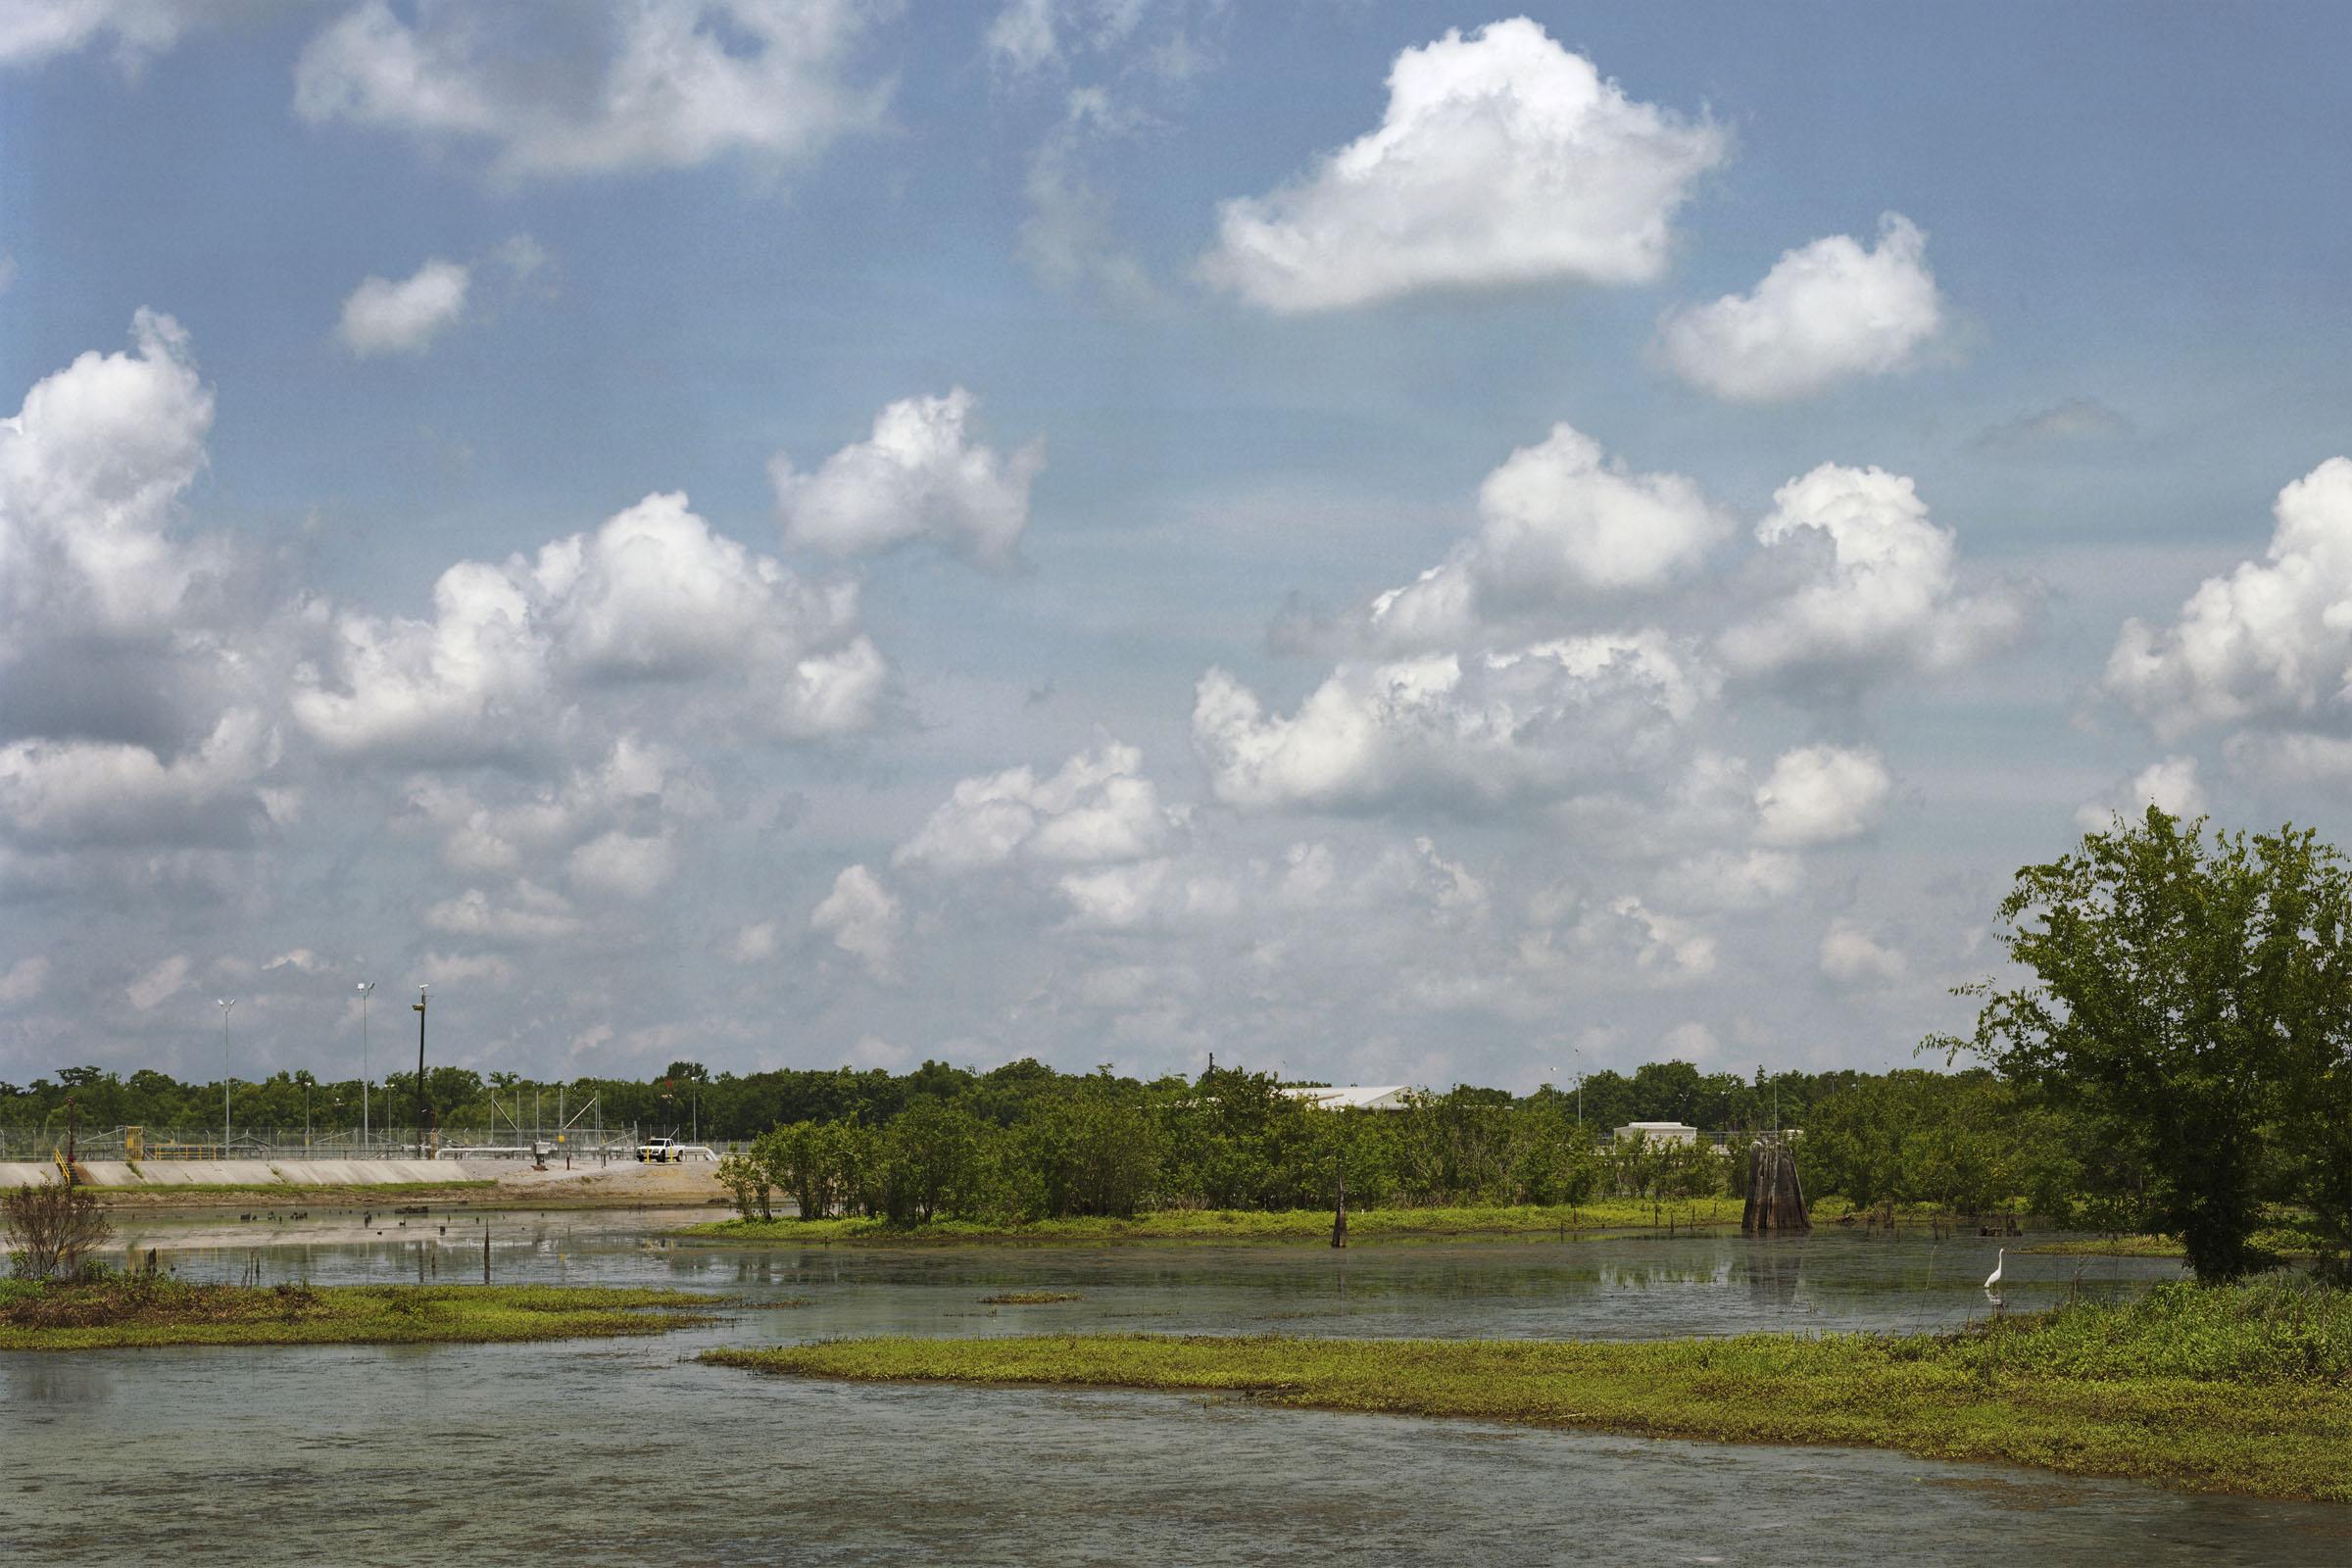 73.1 million barrels, Bayou Choctaw, Louisiana.